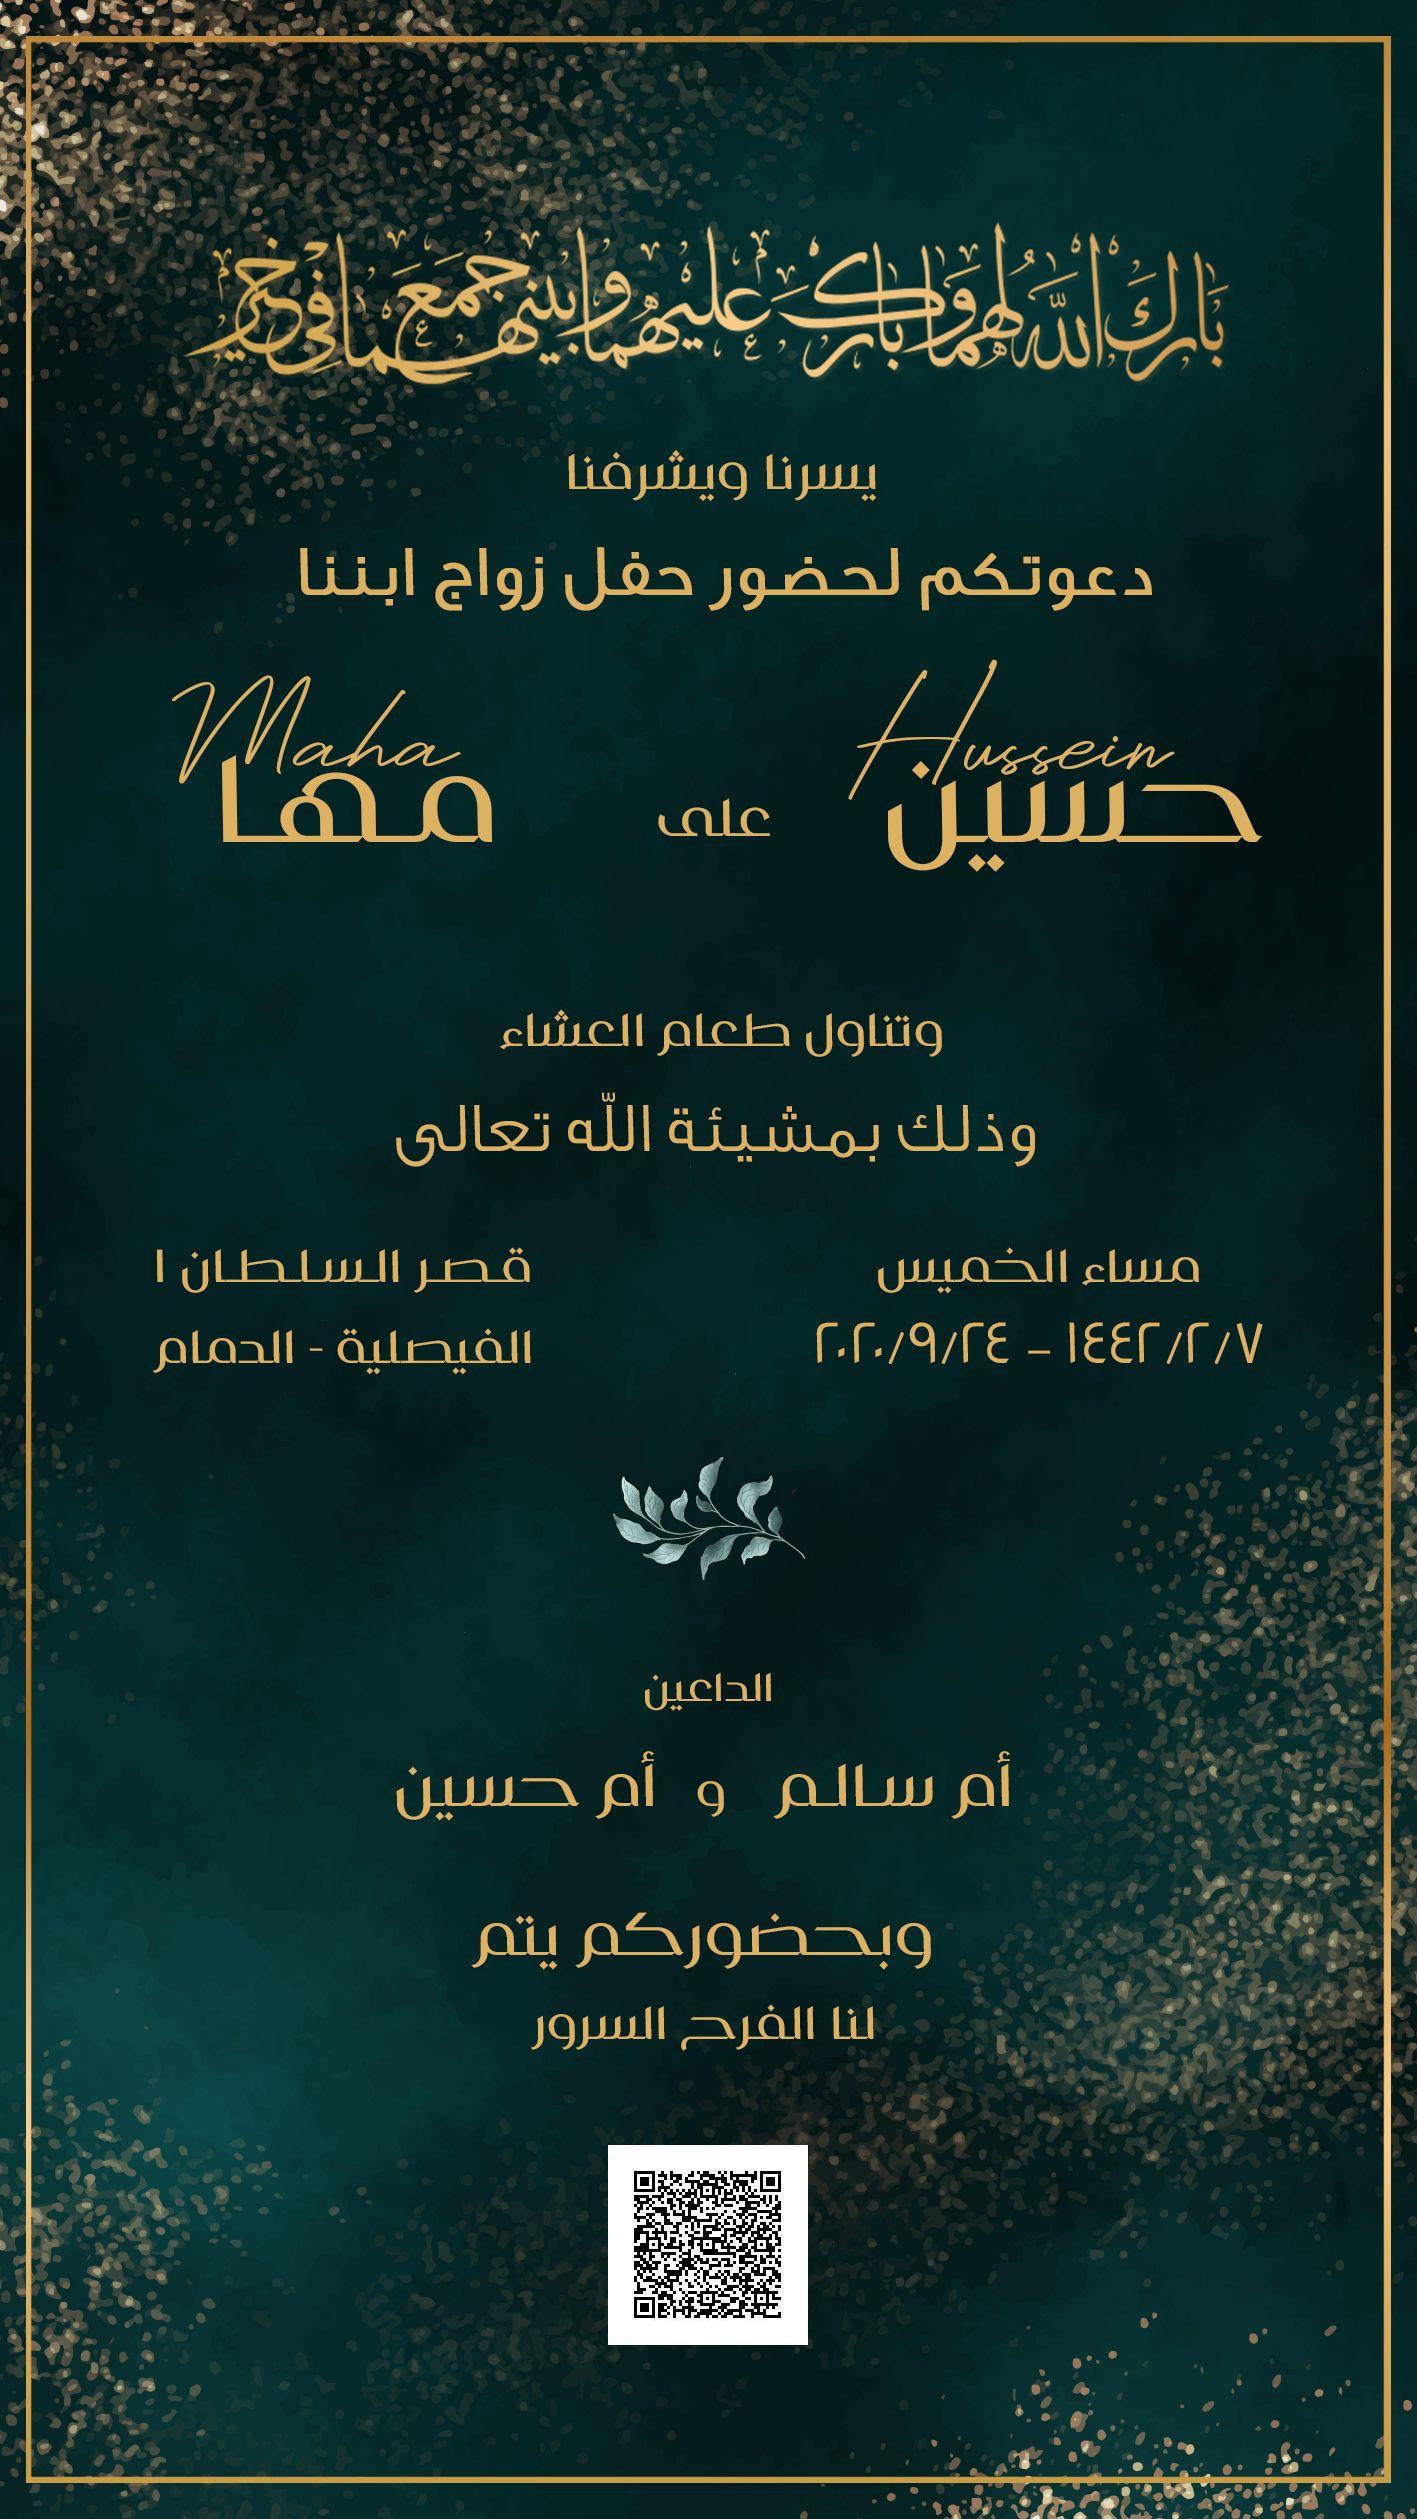 دعوة زواج 9 Wedding Invitation Posters Logo Background Wedding Album